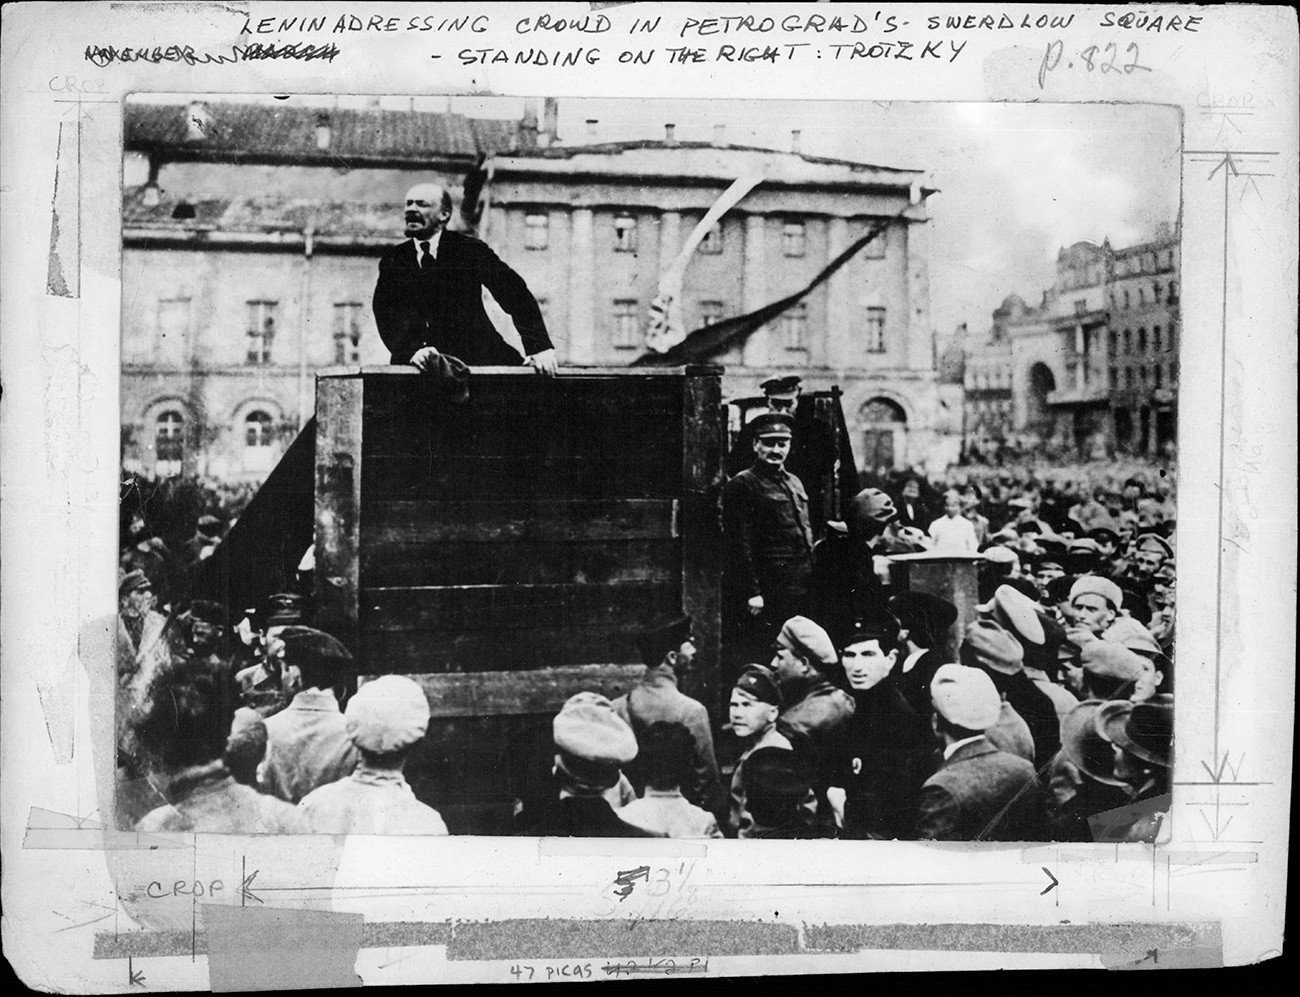 Lenin addressing crowd In Petrograd, 1919